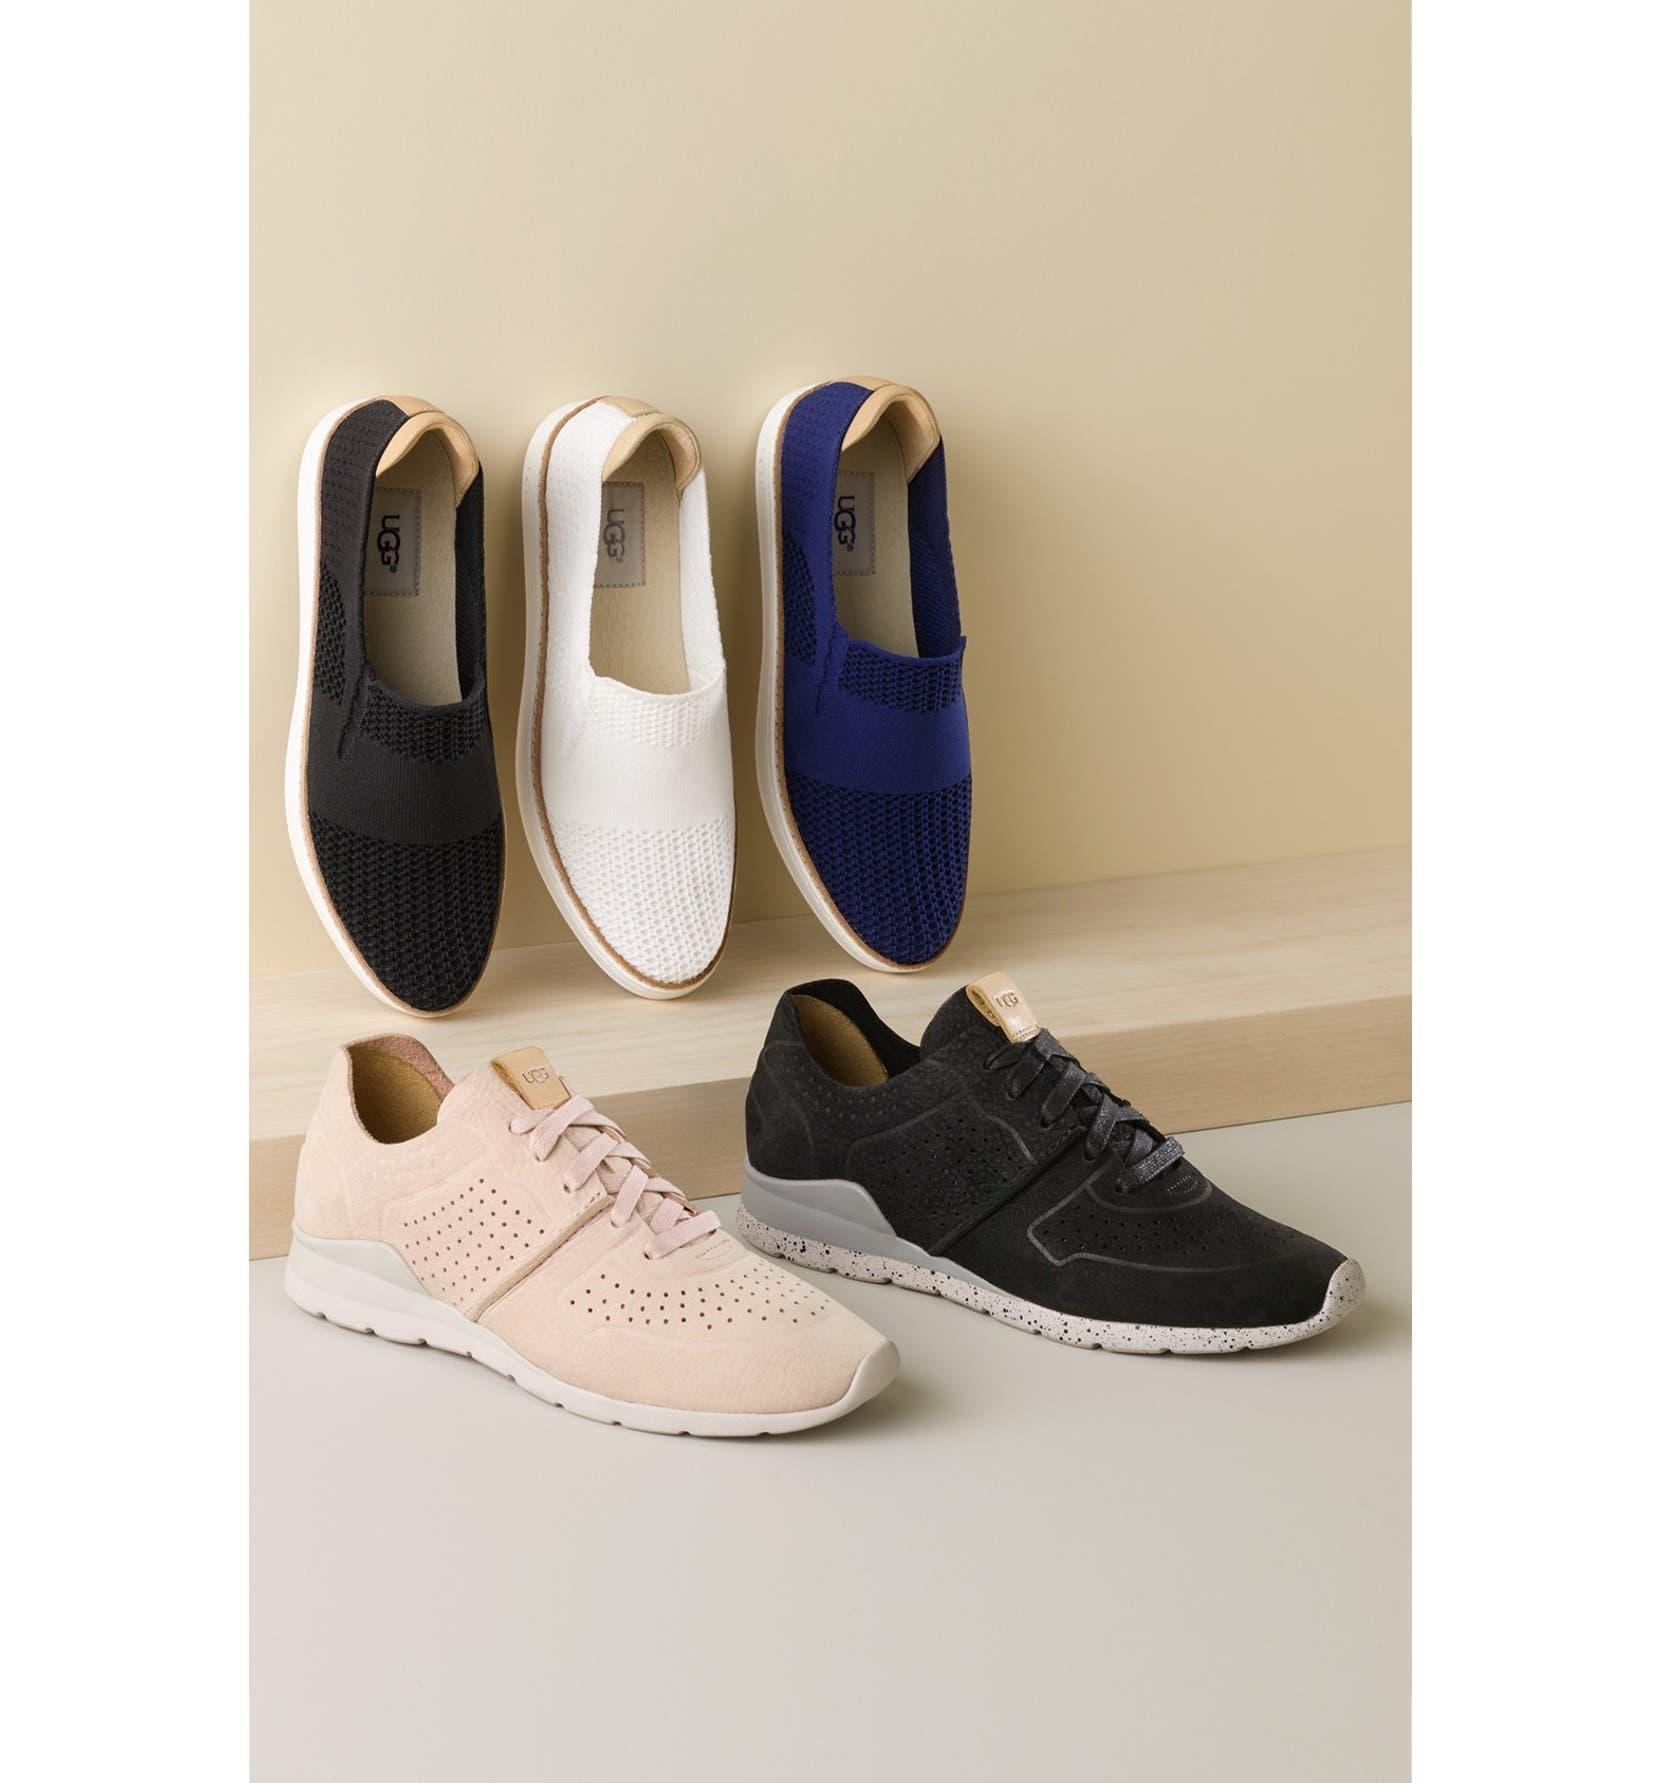 0f91325e6d6 Sammy Sneaker